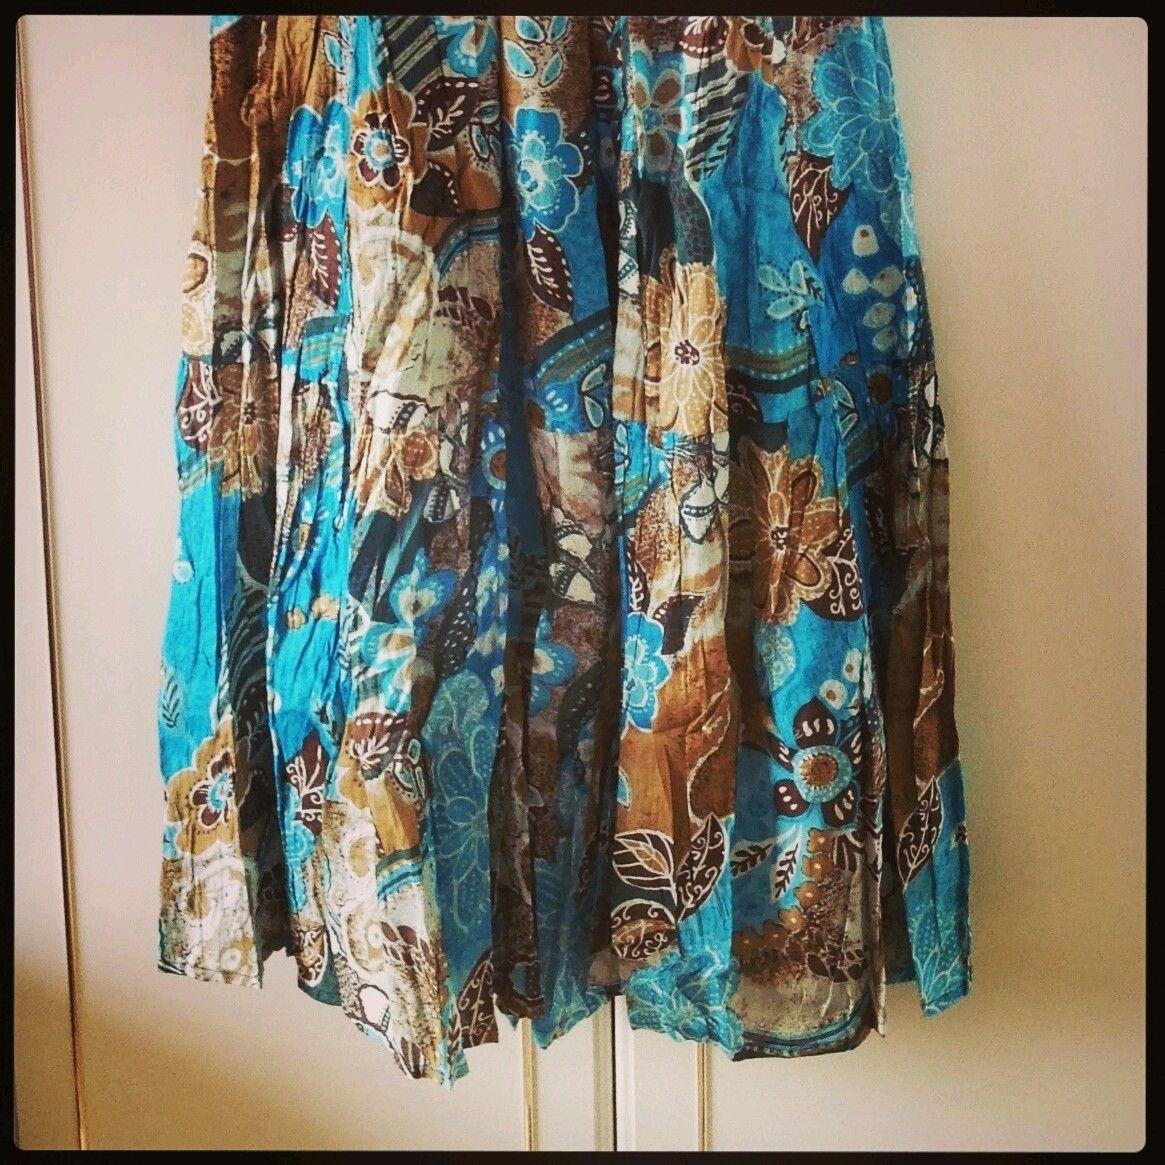 Striking Boho Summer Sun Cotton Maxi Dress 4 Designs, Sizes 10-12 & 14-16 | eBay